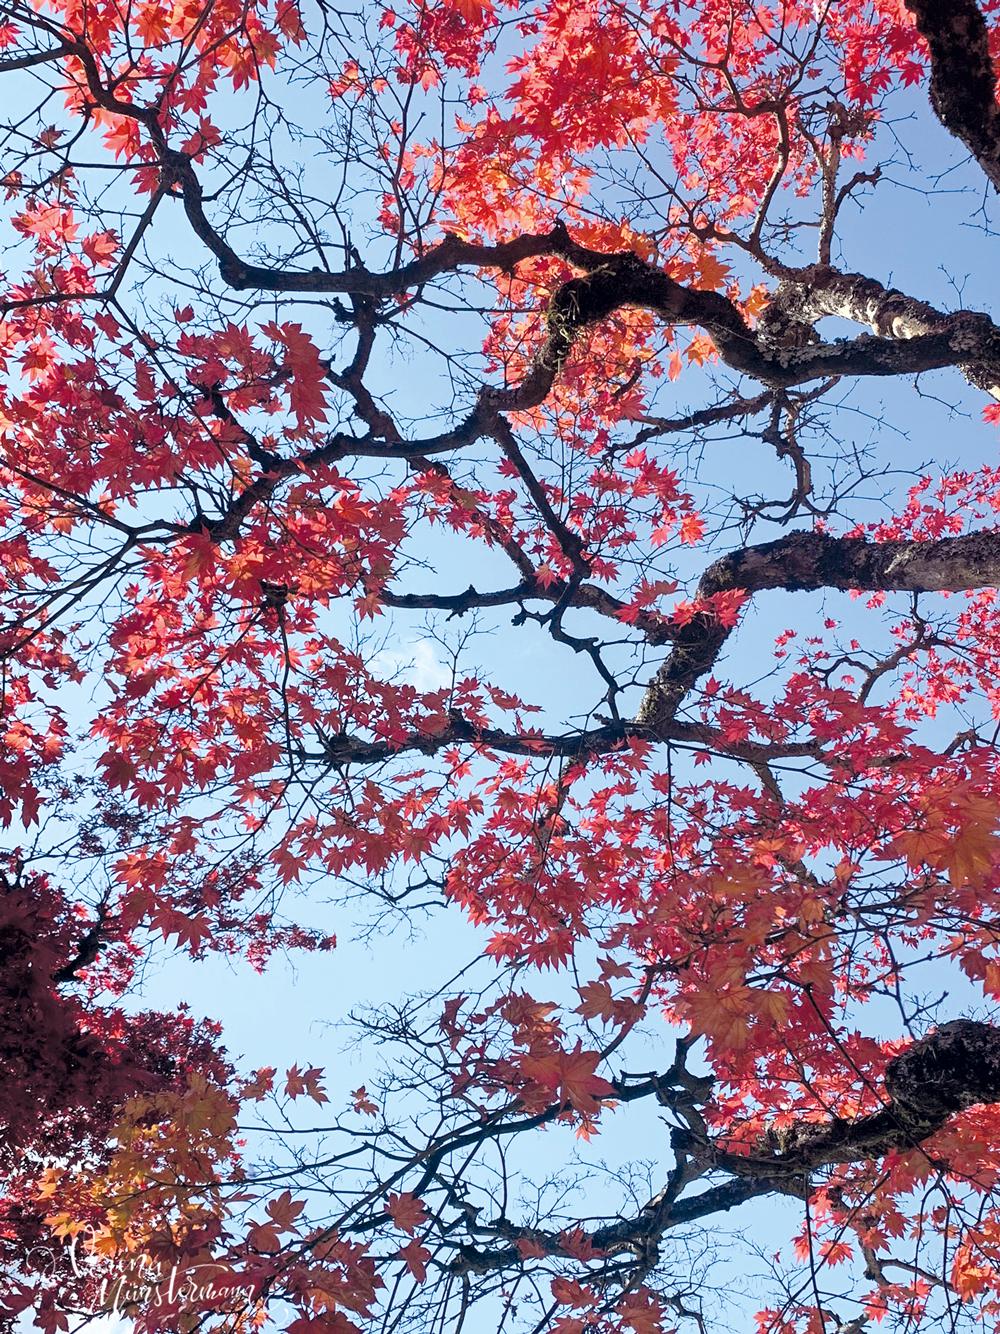 nach-Japan-reisen_tokio_laubfaerbung_verenamuenstermann